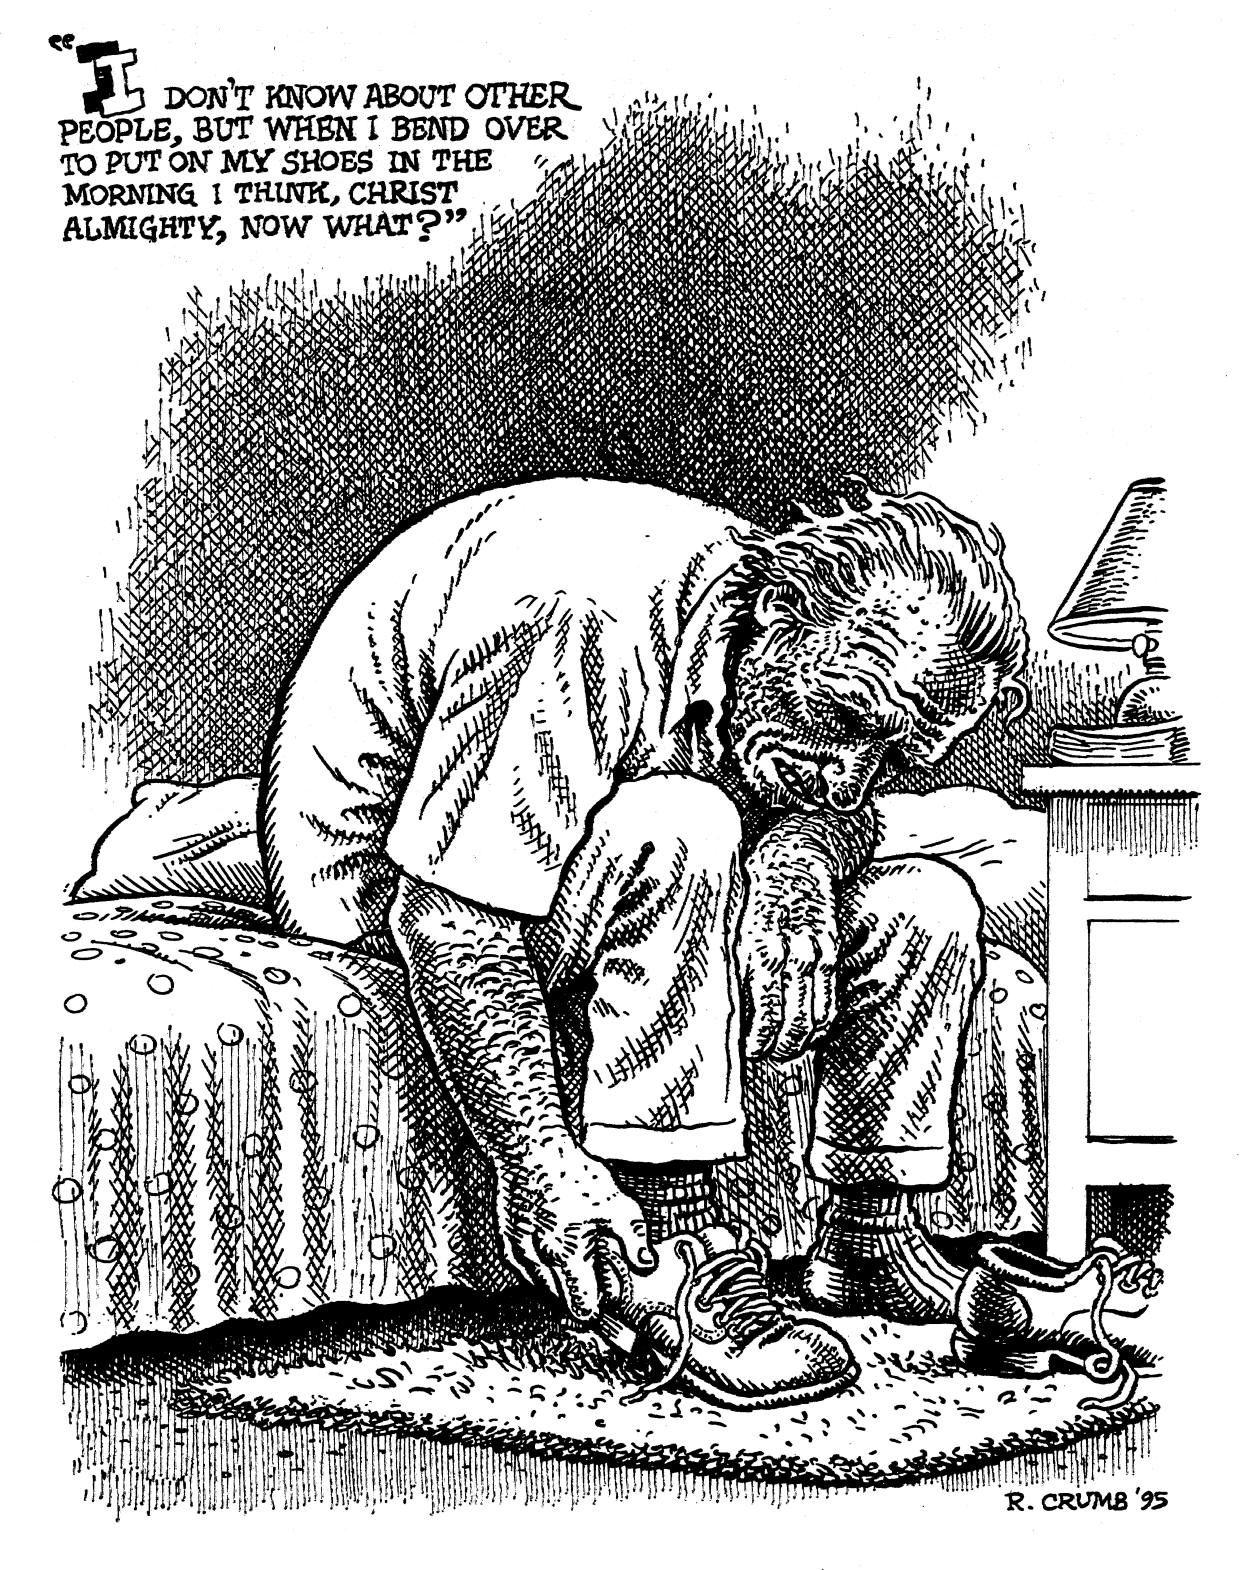 R crumb illustration of charles bukowski